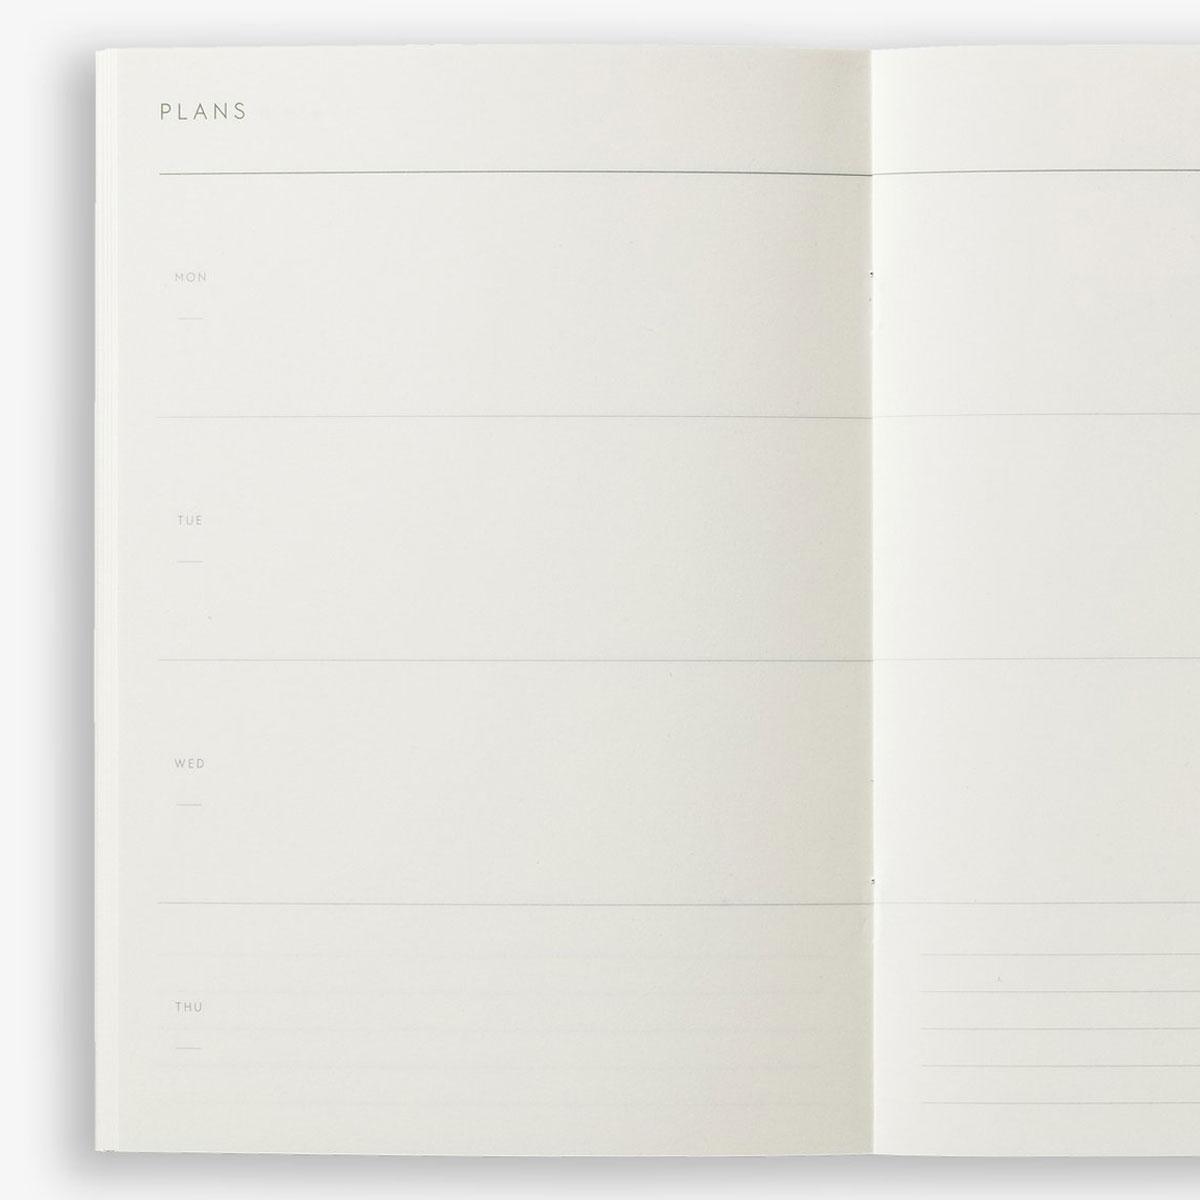 Planificador Semanal Kartotek Weekly